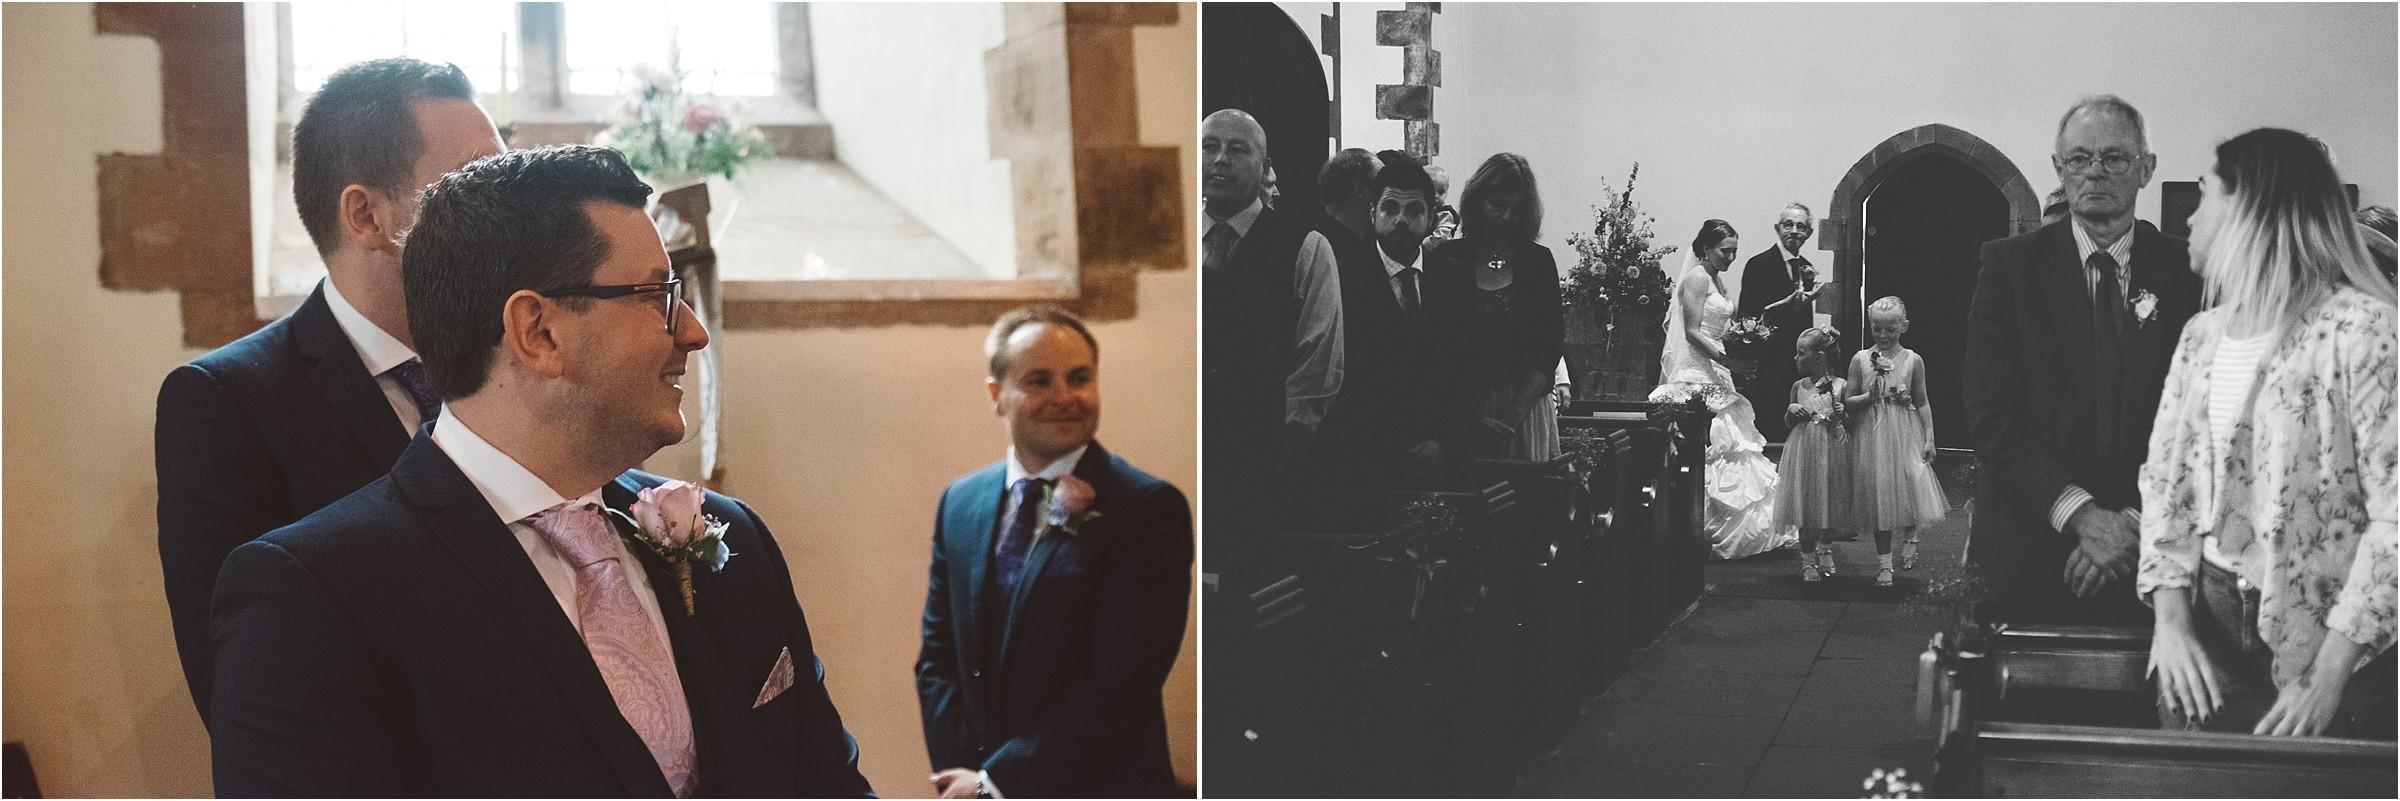 089 tipi wedding T1012245